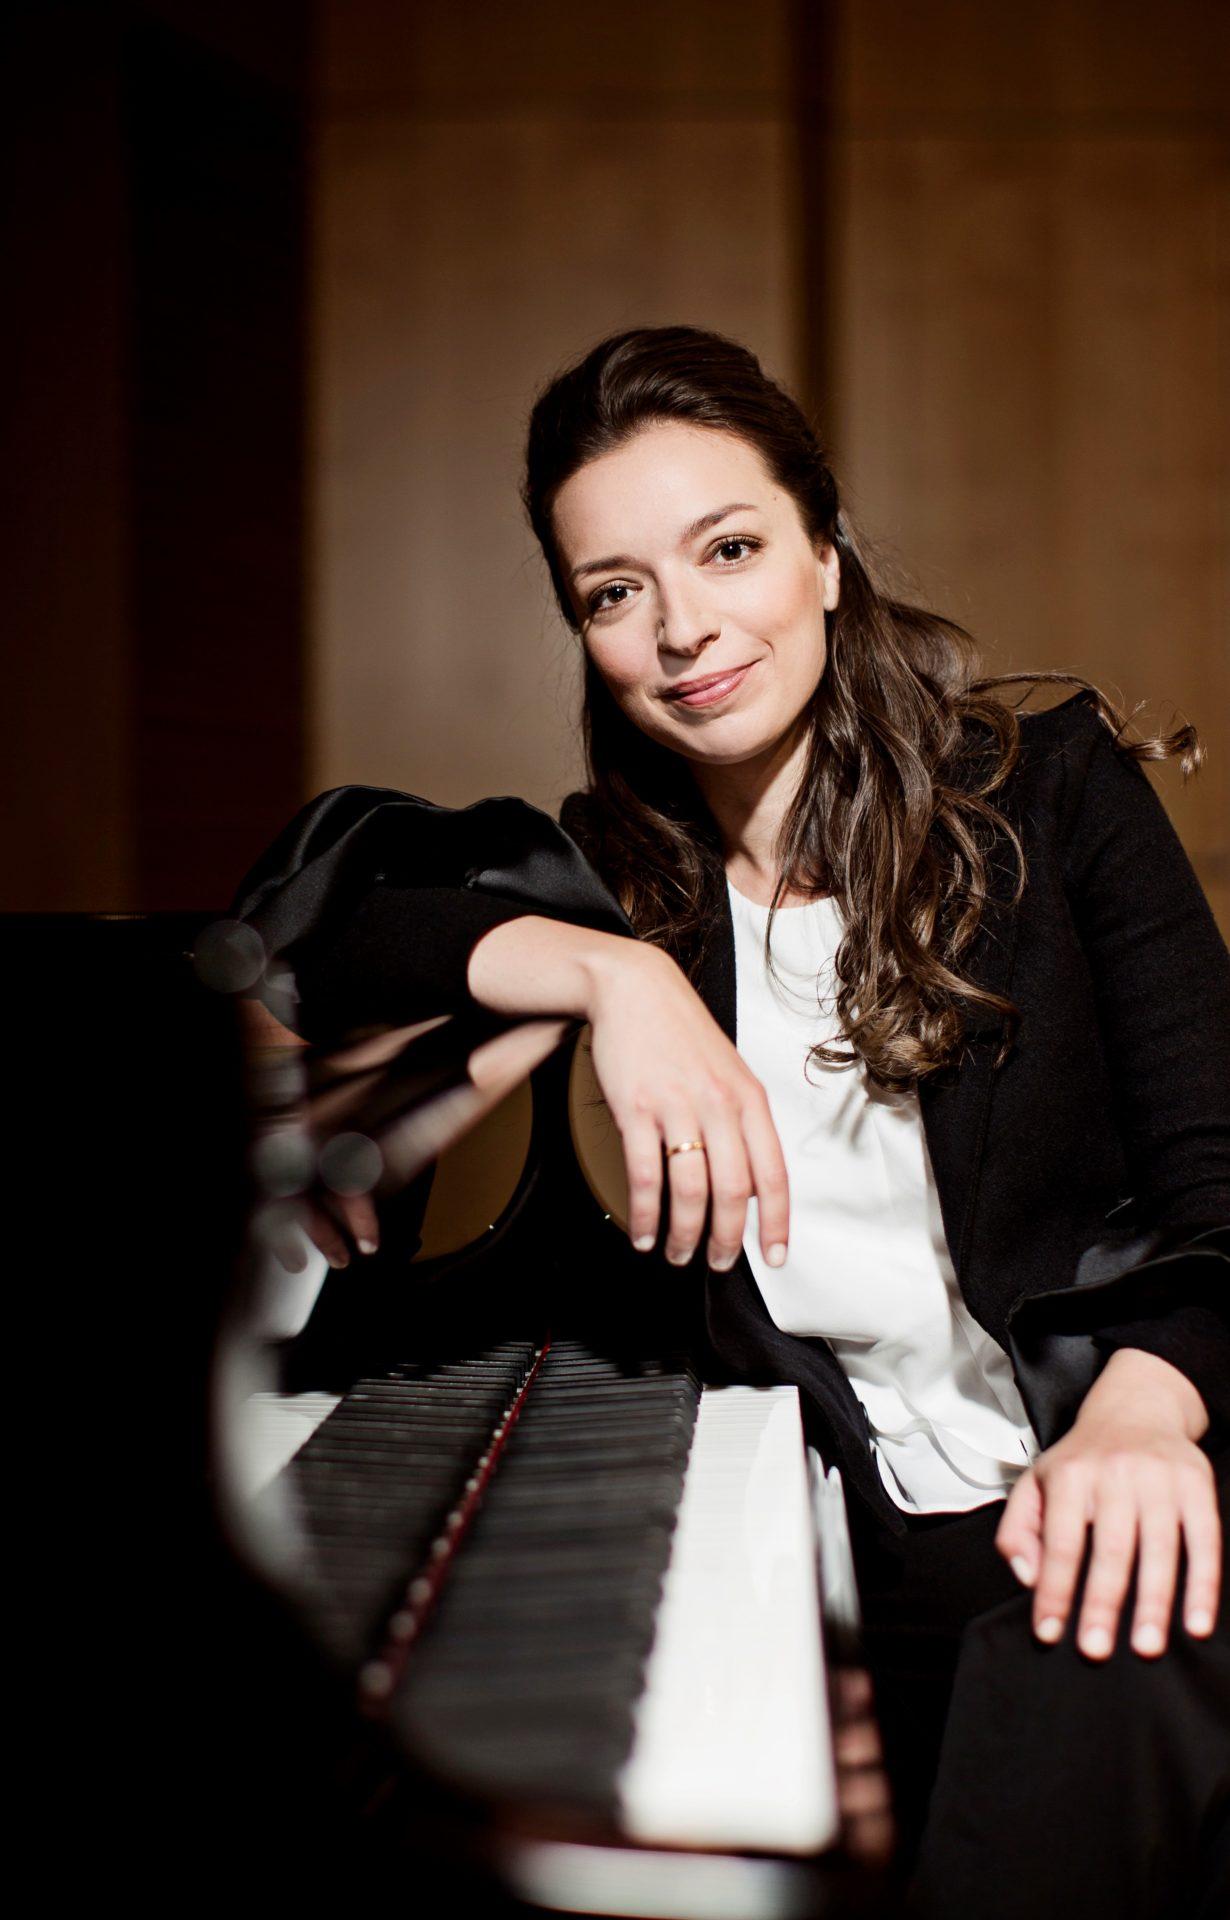 Klavierissimo - Yulianna Avdeeva